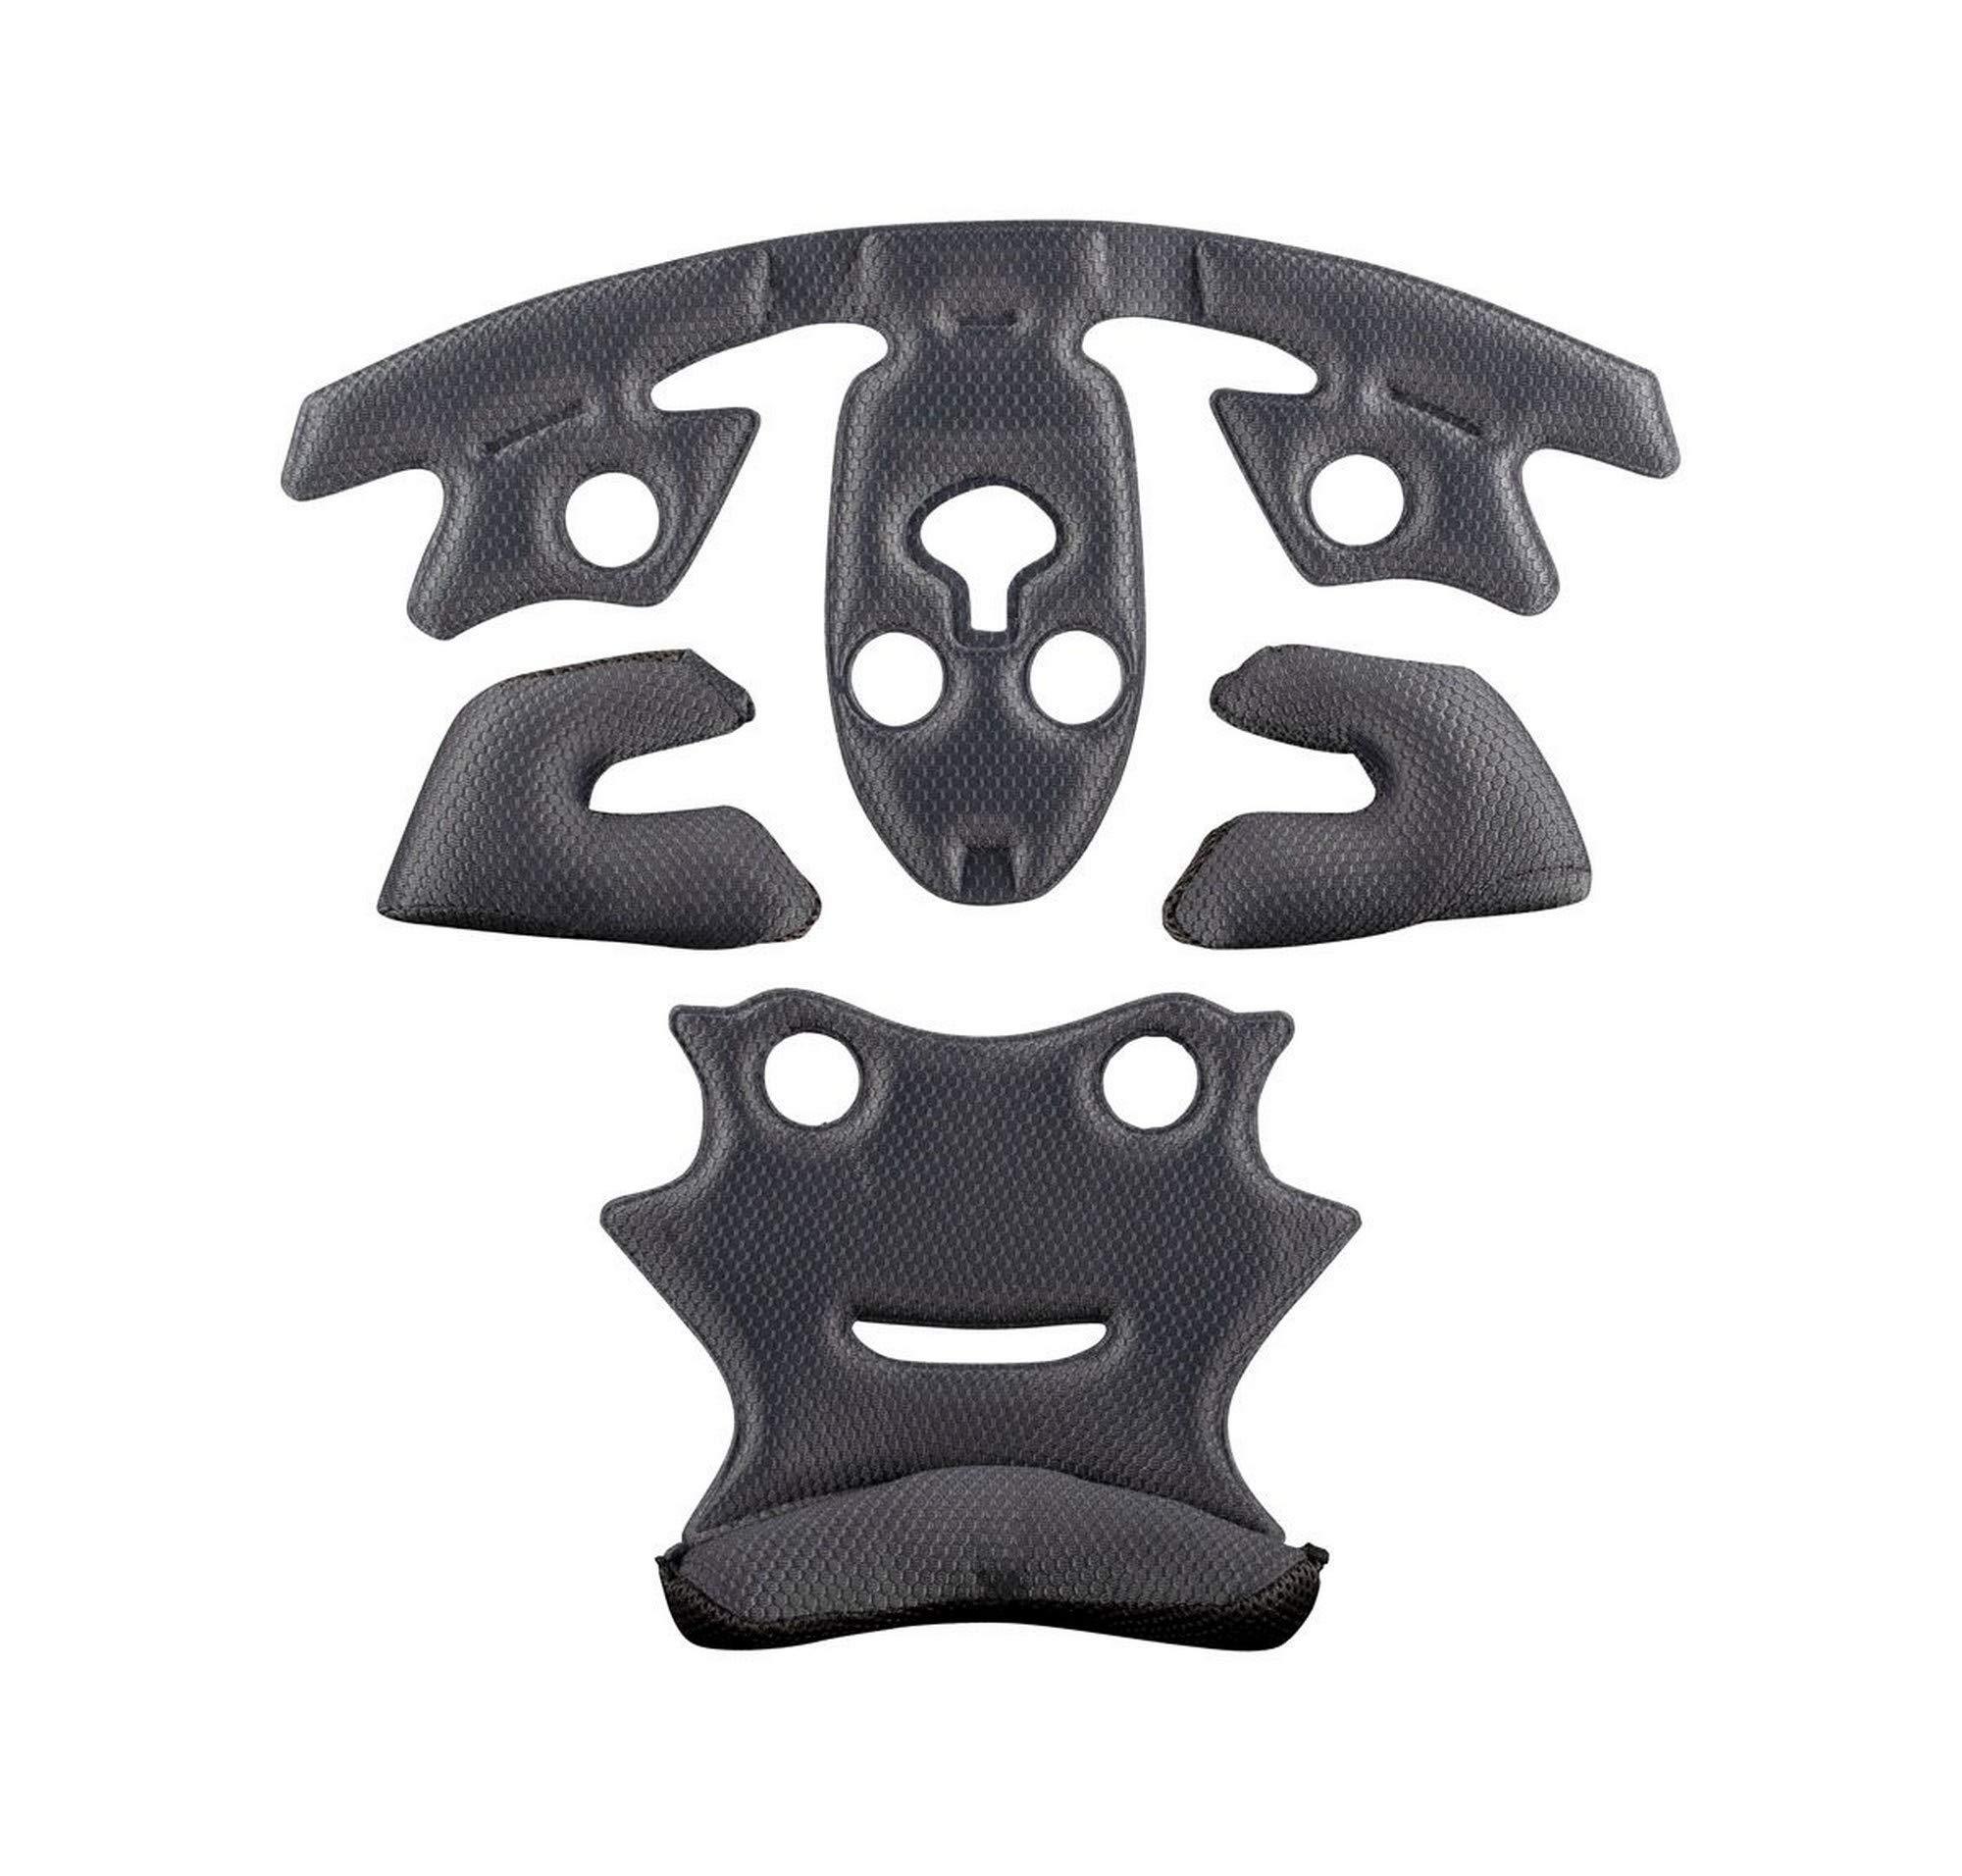 Leatt DBX 4.0 Inner Liner Kit Off-Road Motorcycle Helmet Accessories - Grey/Large by Leatt Brace